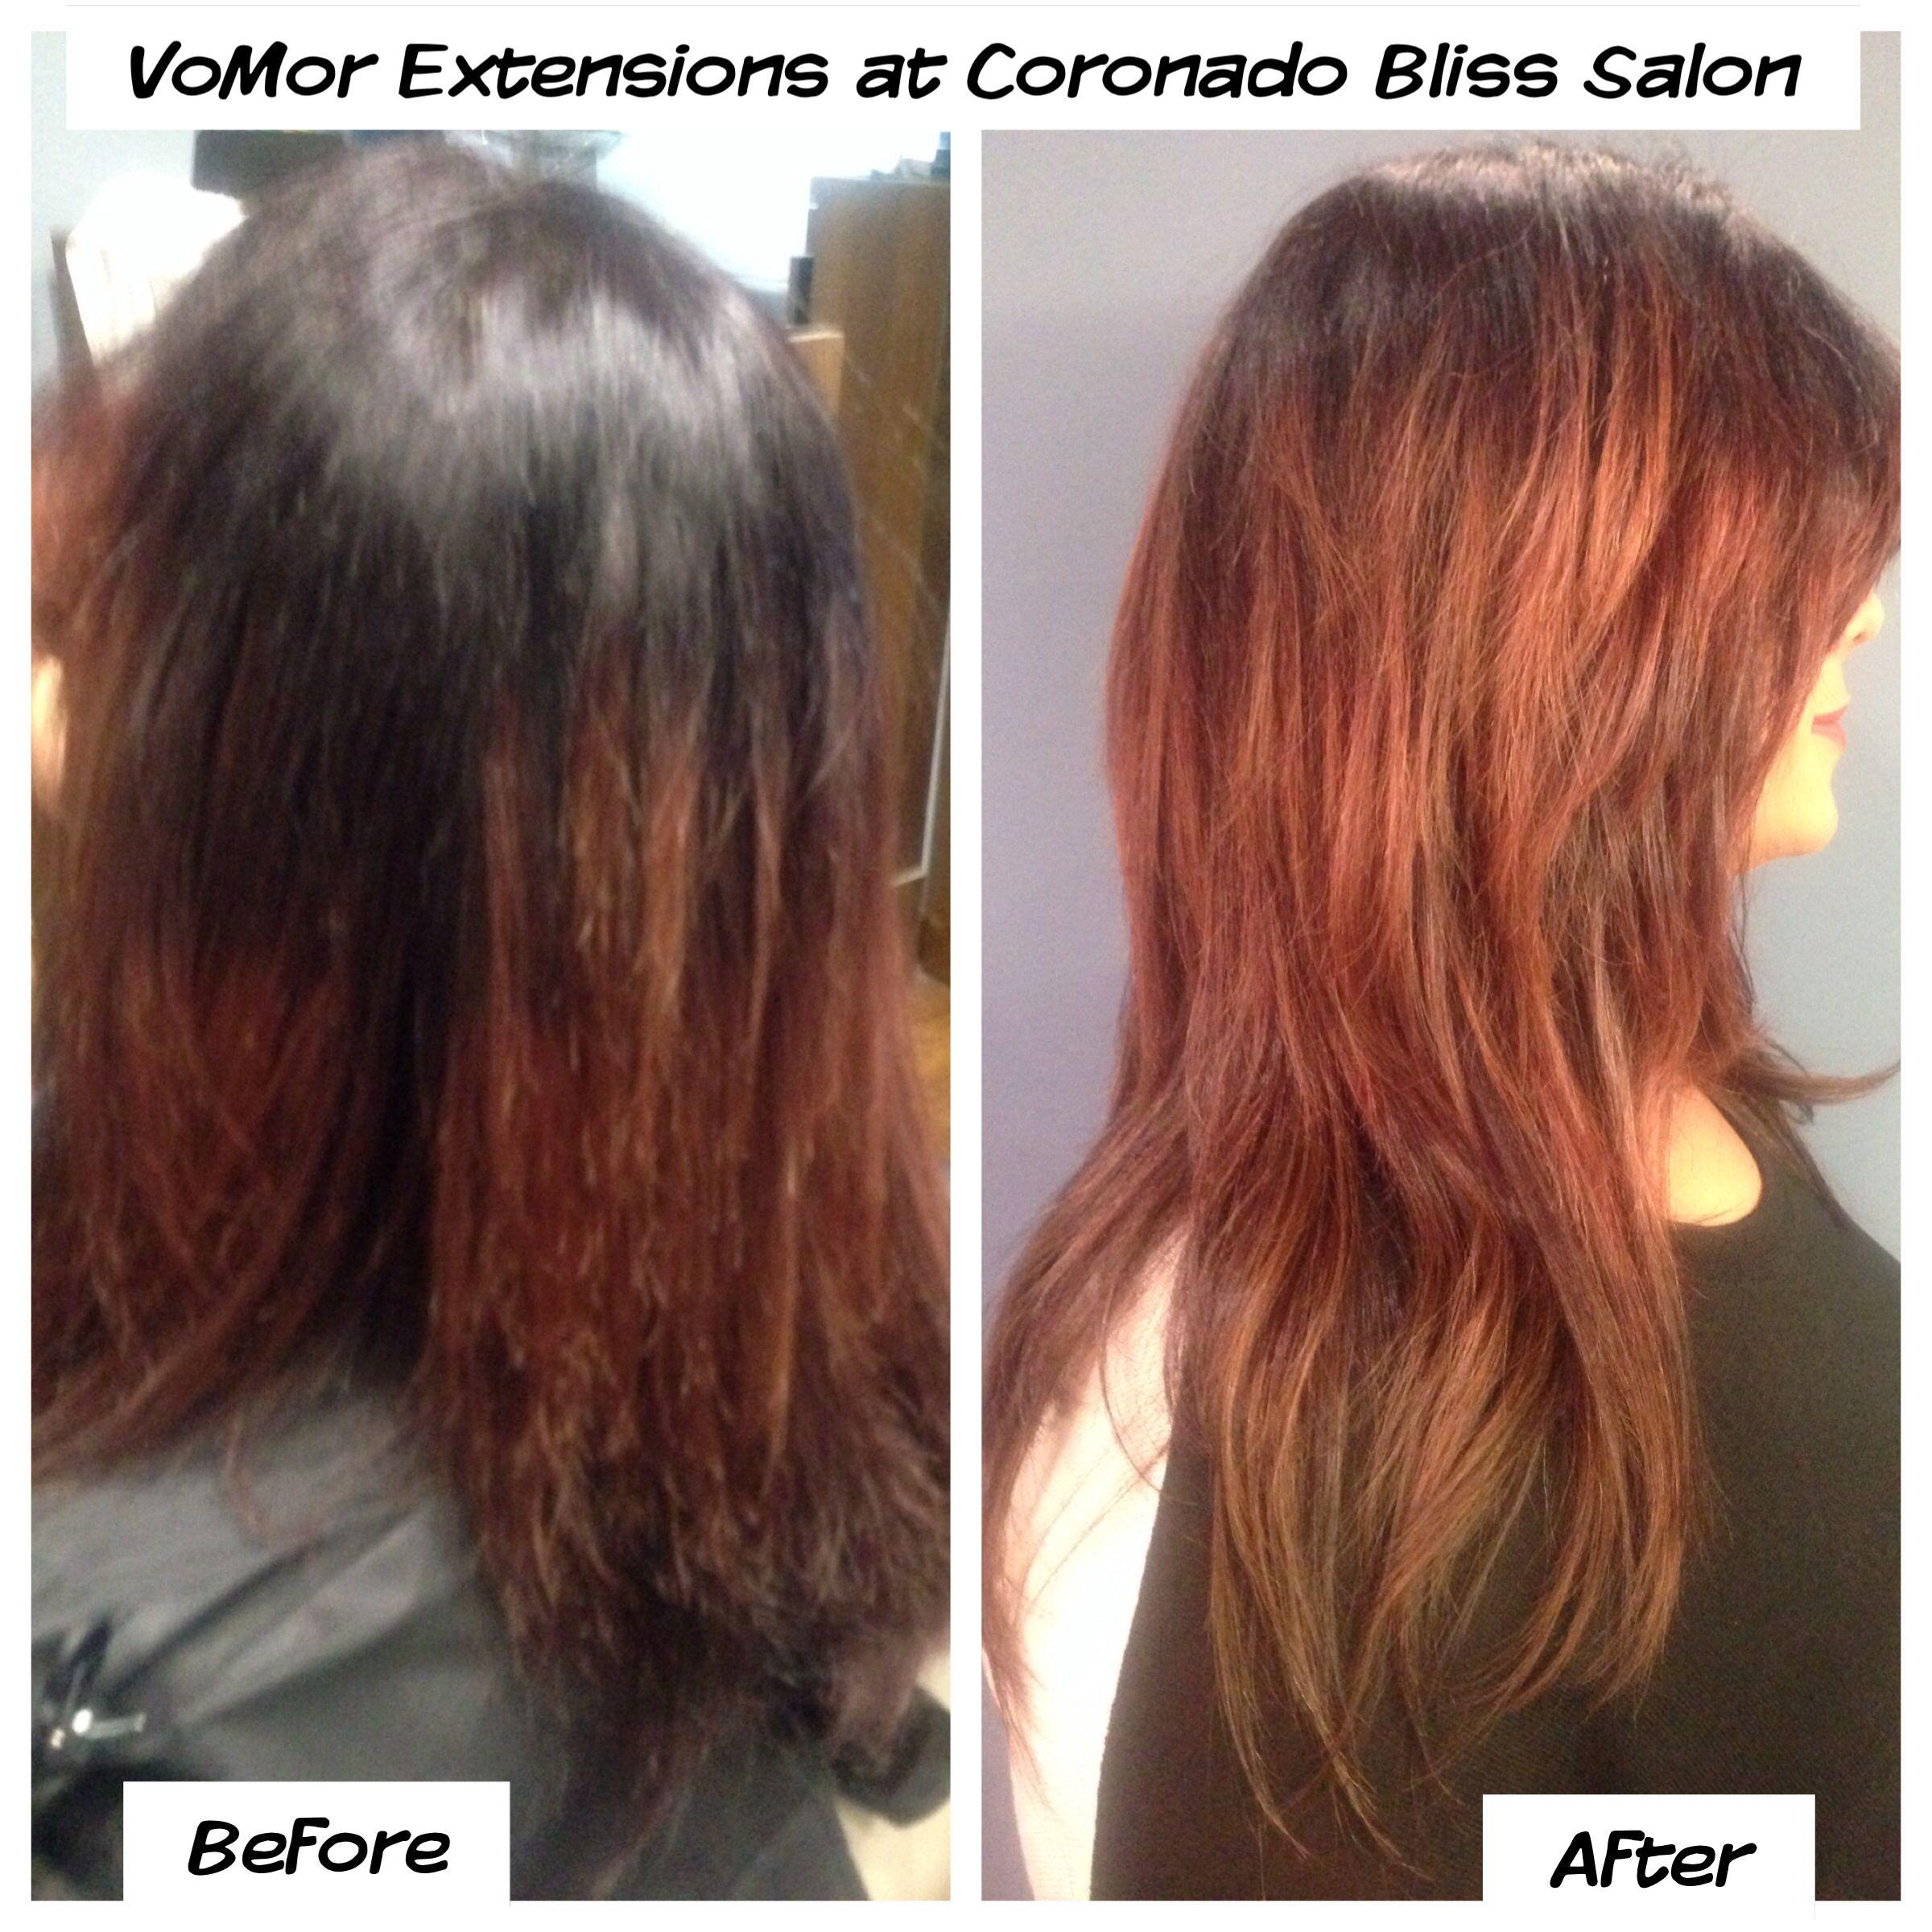 Vomor hair extensions vomor hair extensions pinterest hair